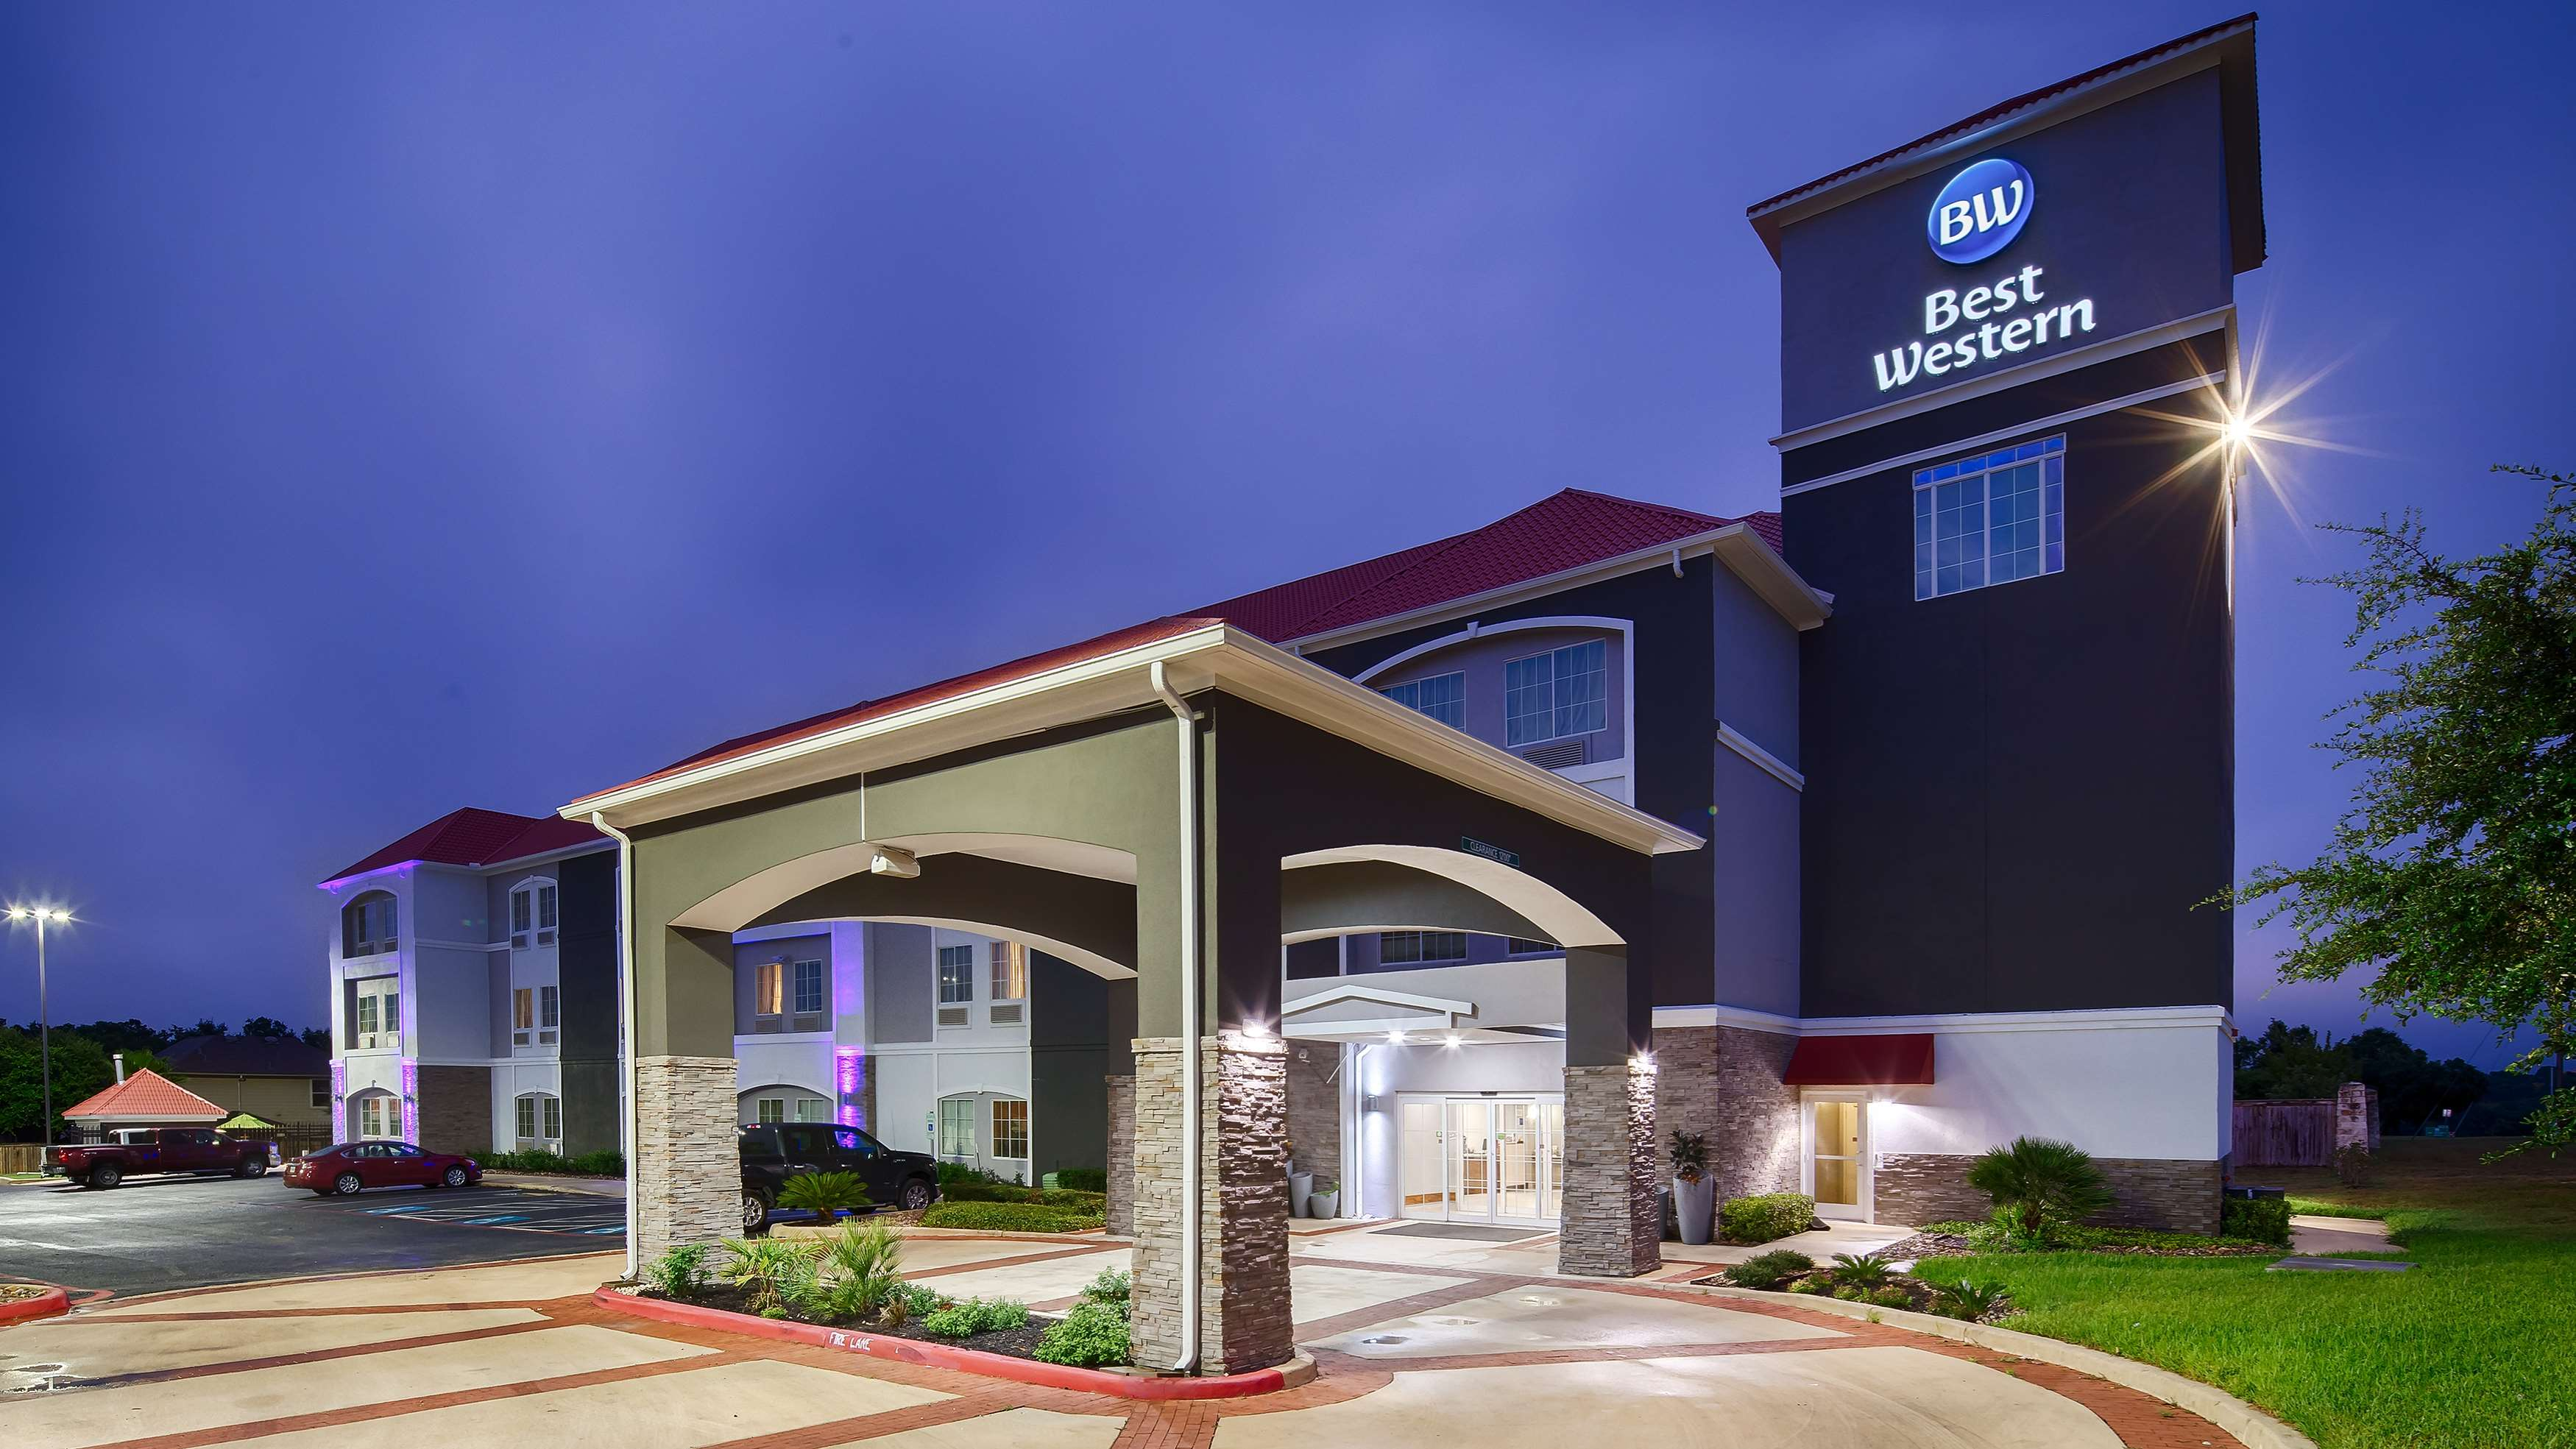 Best Hotels In Boerne Texas